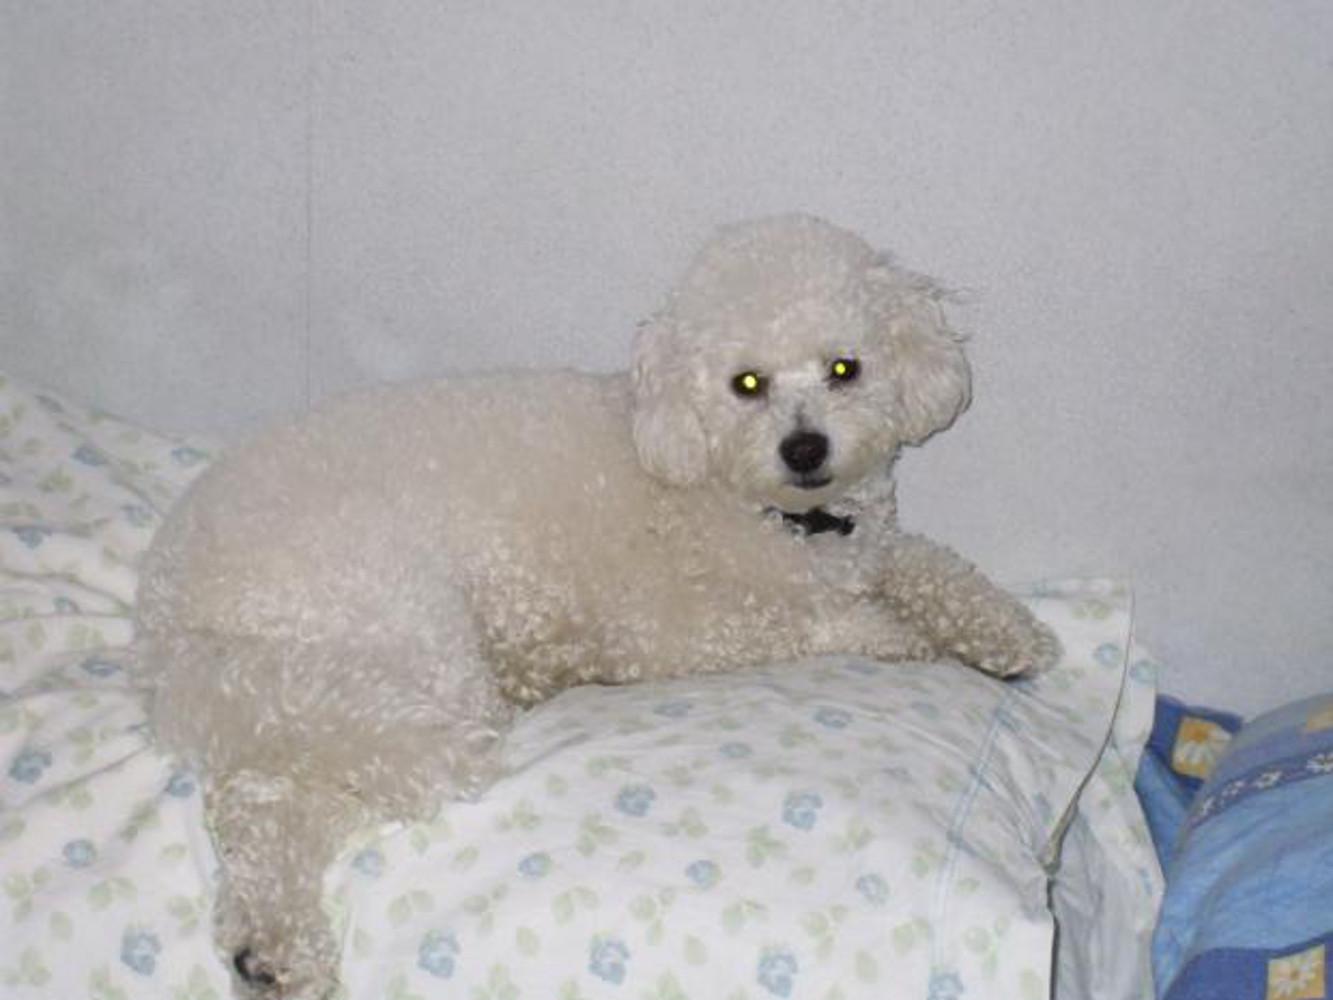 Puddle, Bed, Dog, White, HQ Photo